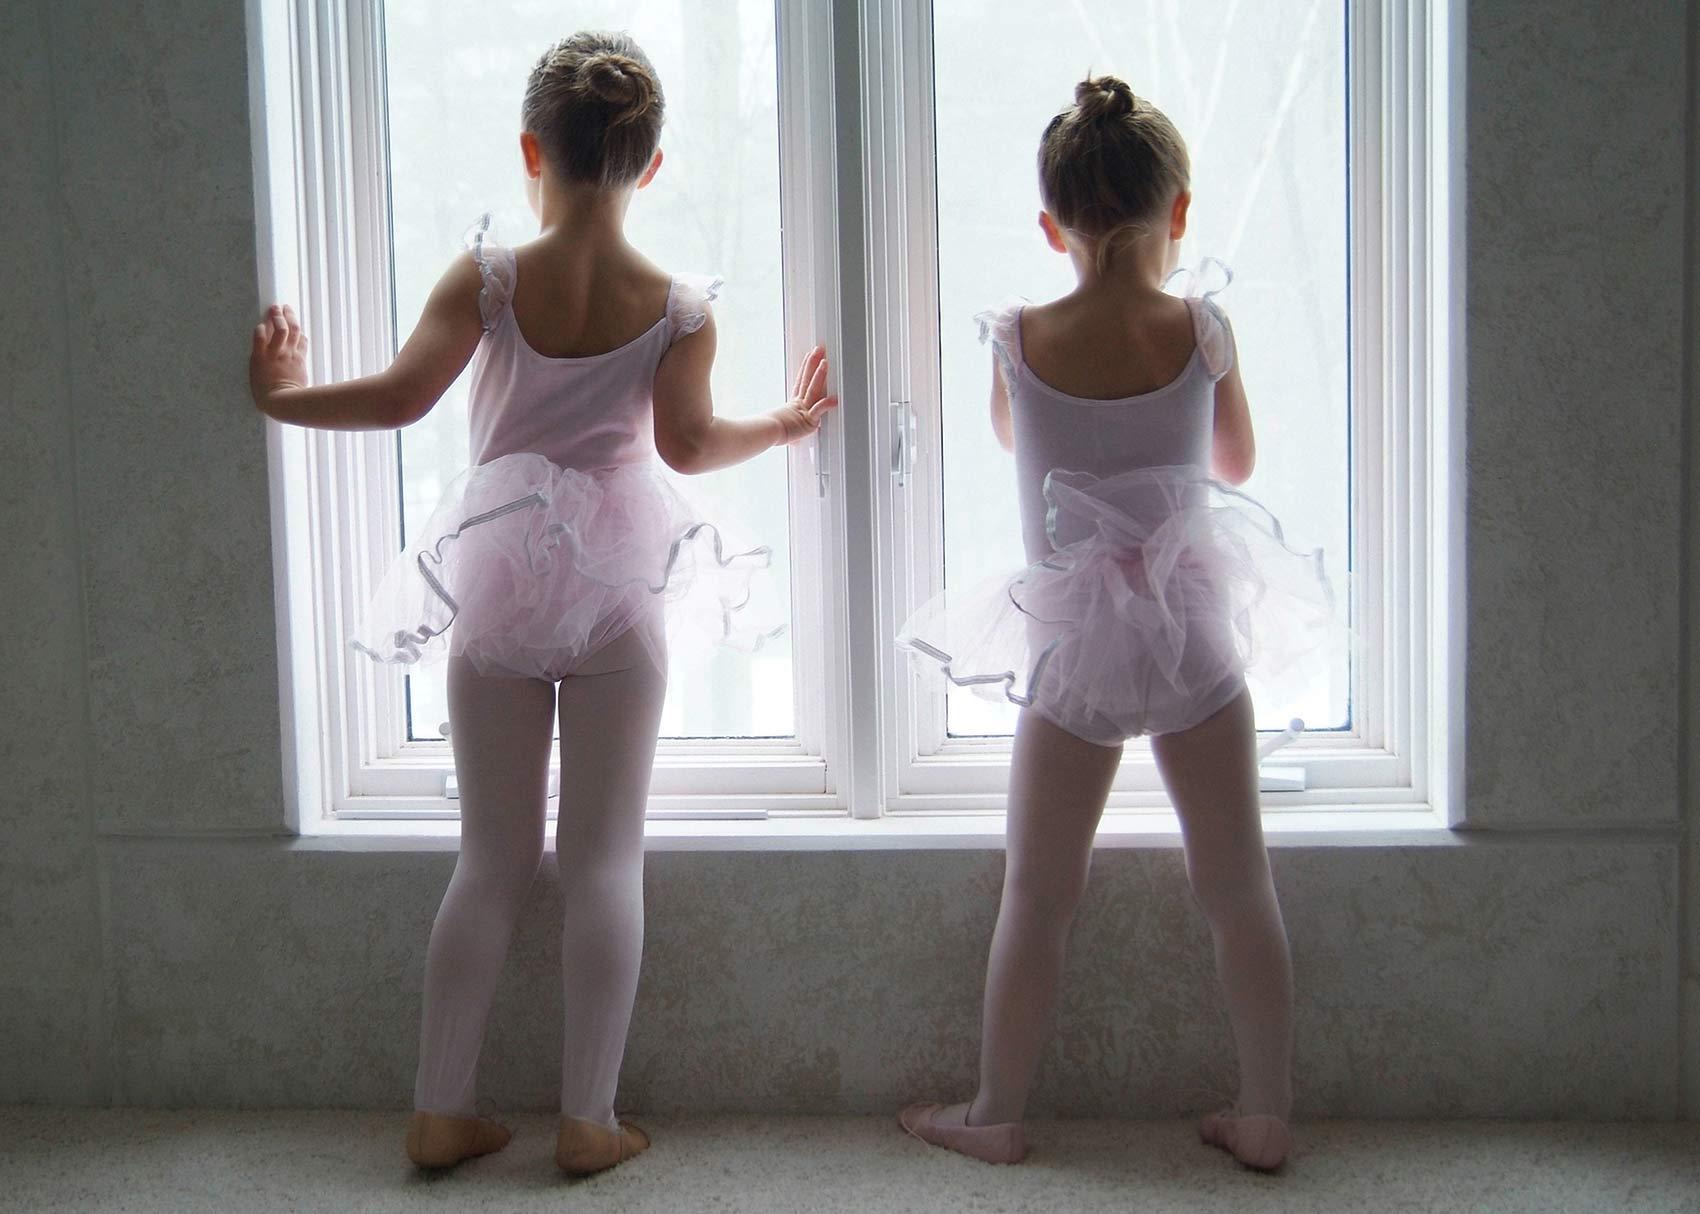 35b633d4e0bd Ballerina Books for Your Tiny Dancer